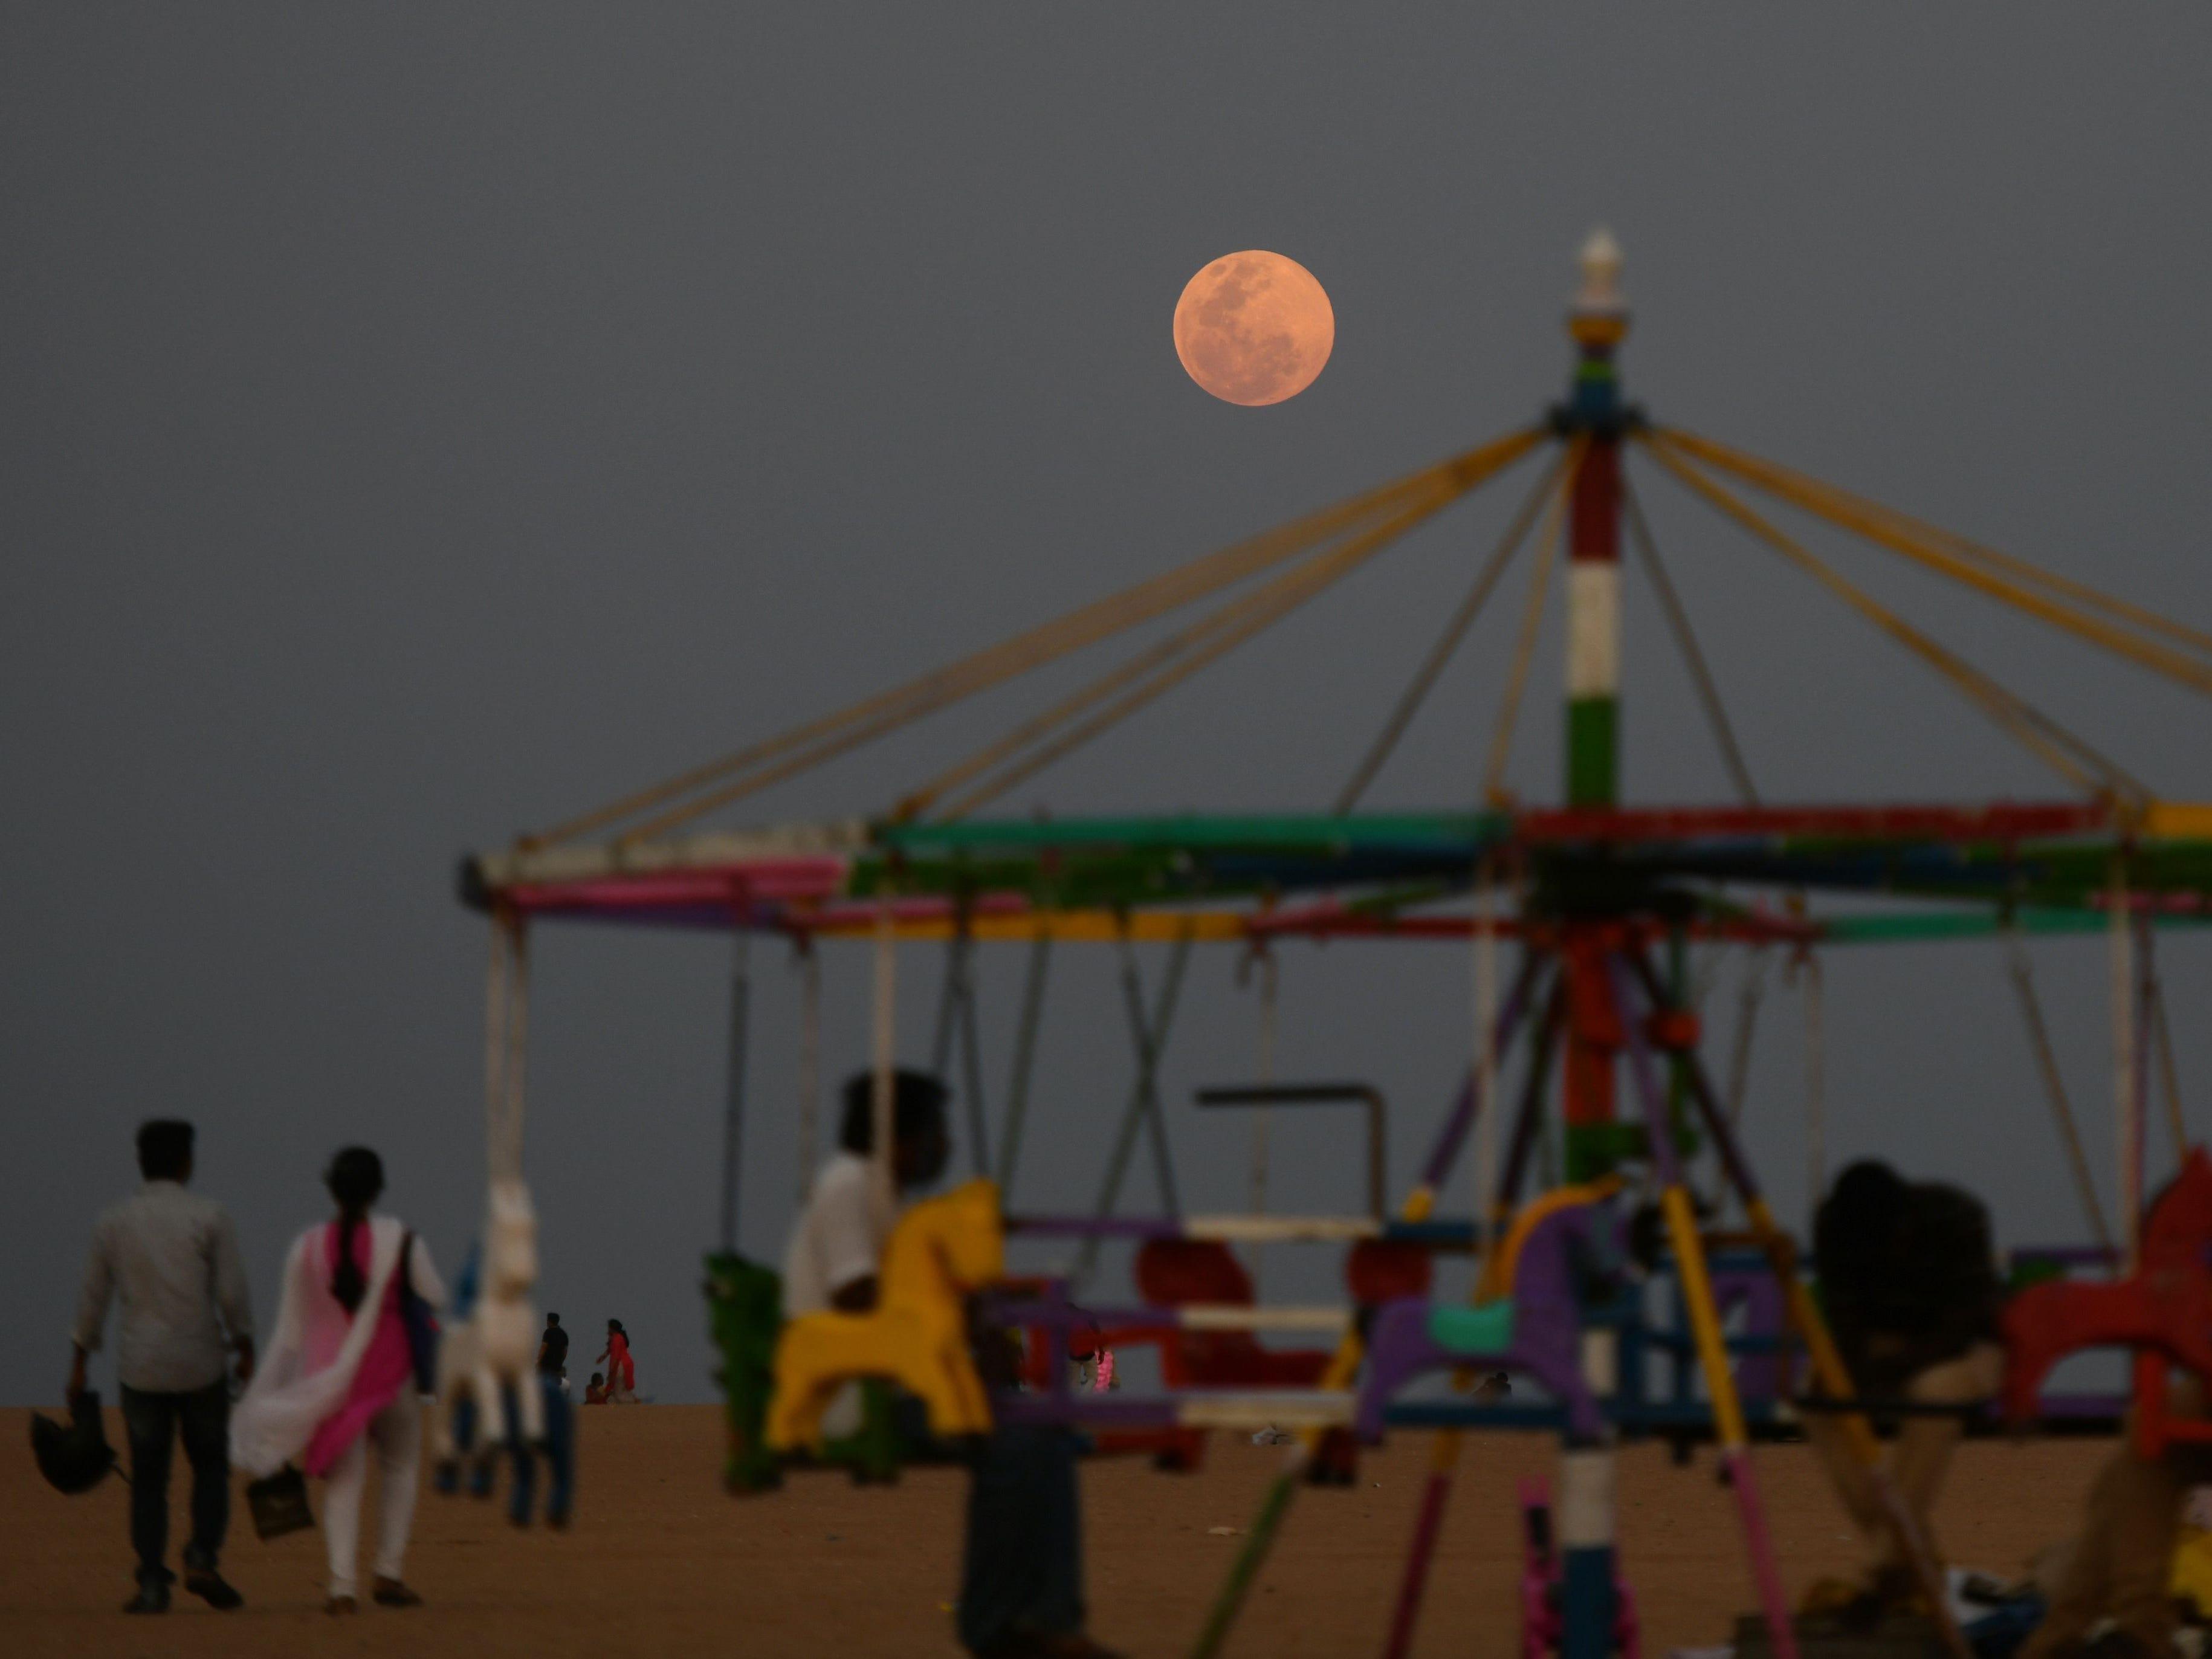 A supermoon rises as residents enjoy the evening at Marina Beach in Chennai,  India on Feb. 19, 2019.